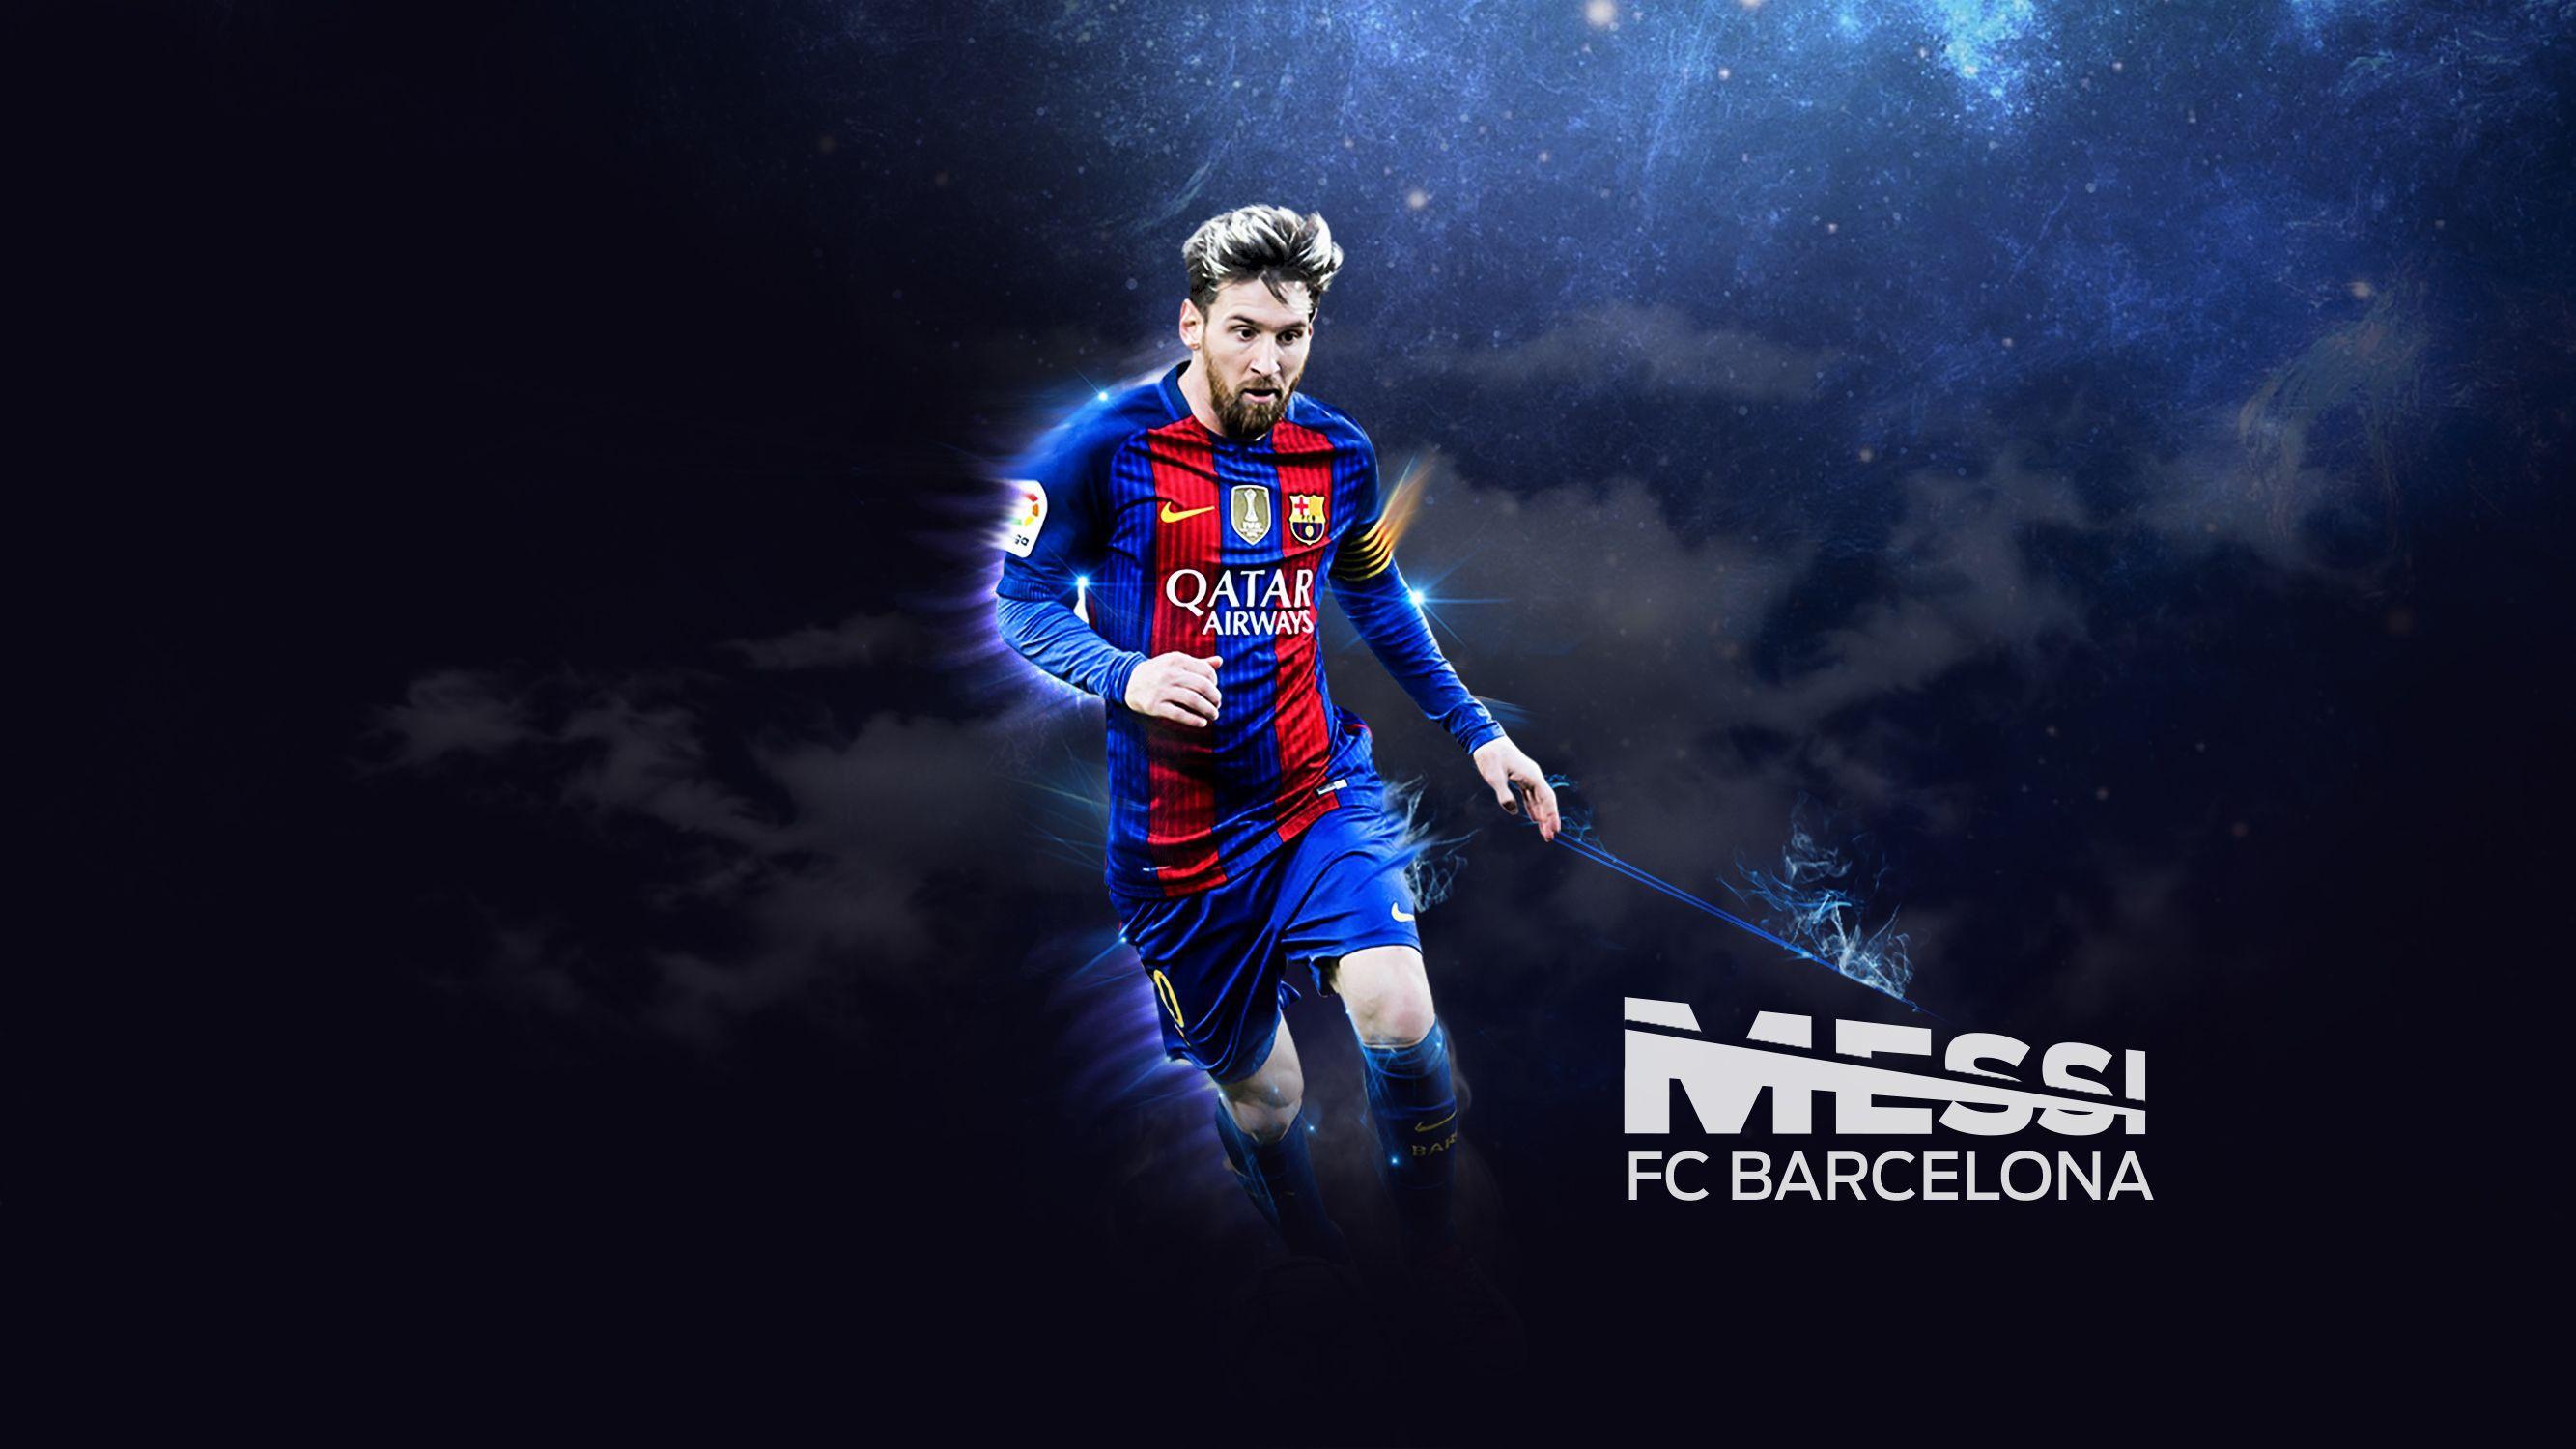 Barcelona Fc Wallpapers Messi Wallpaper Cave